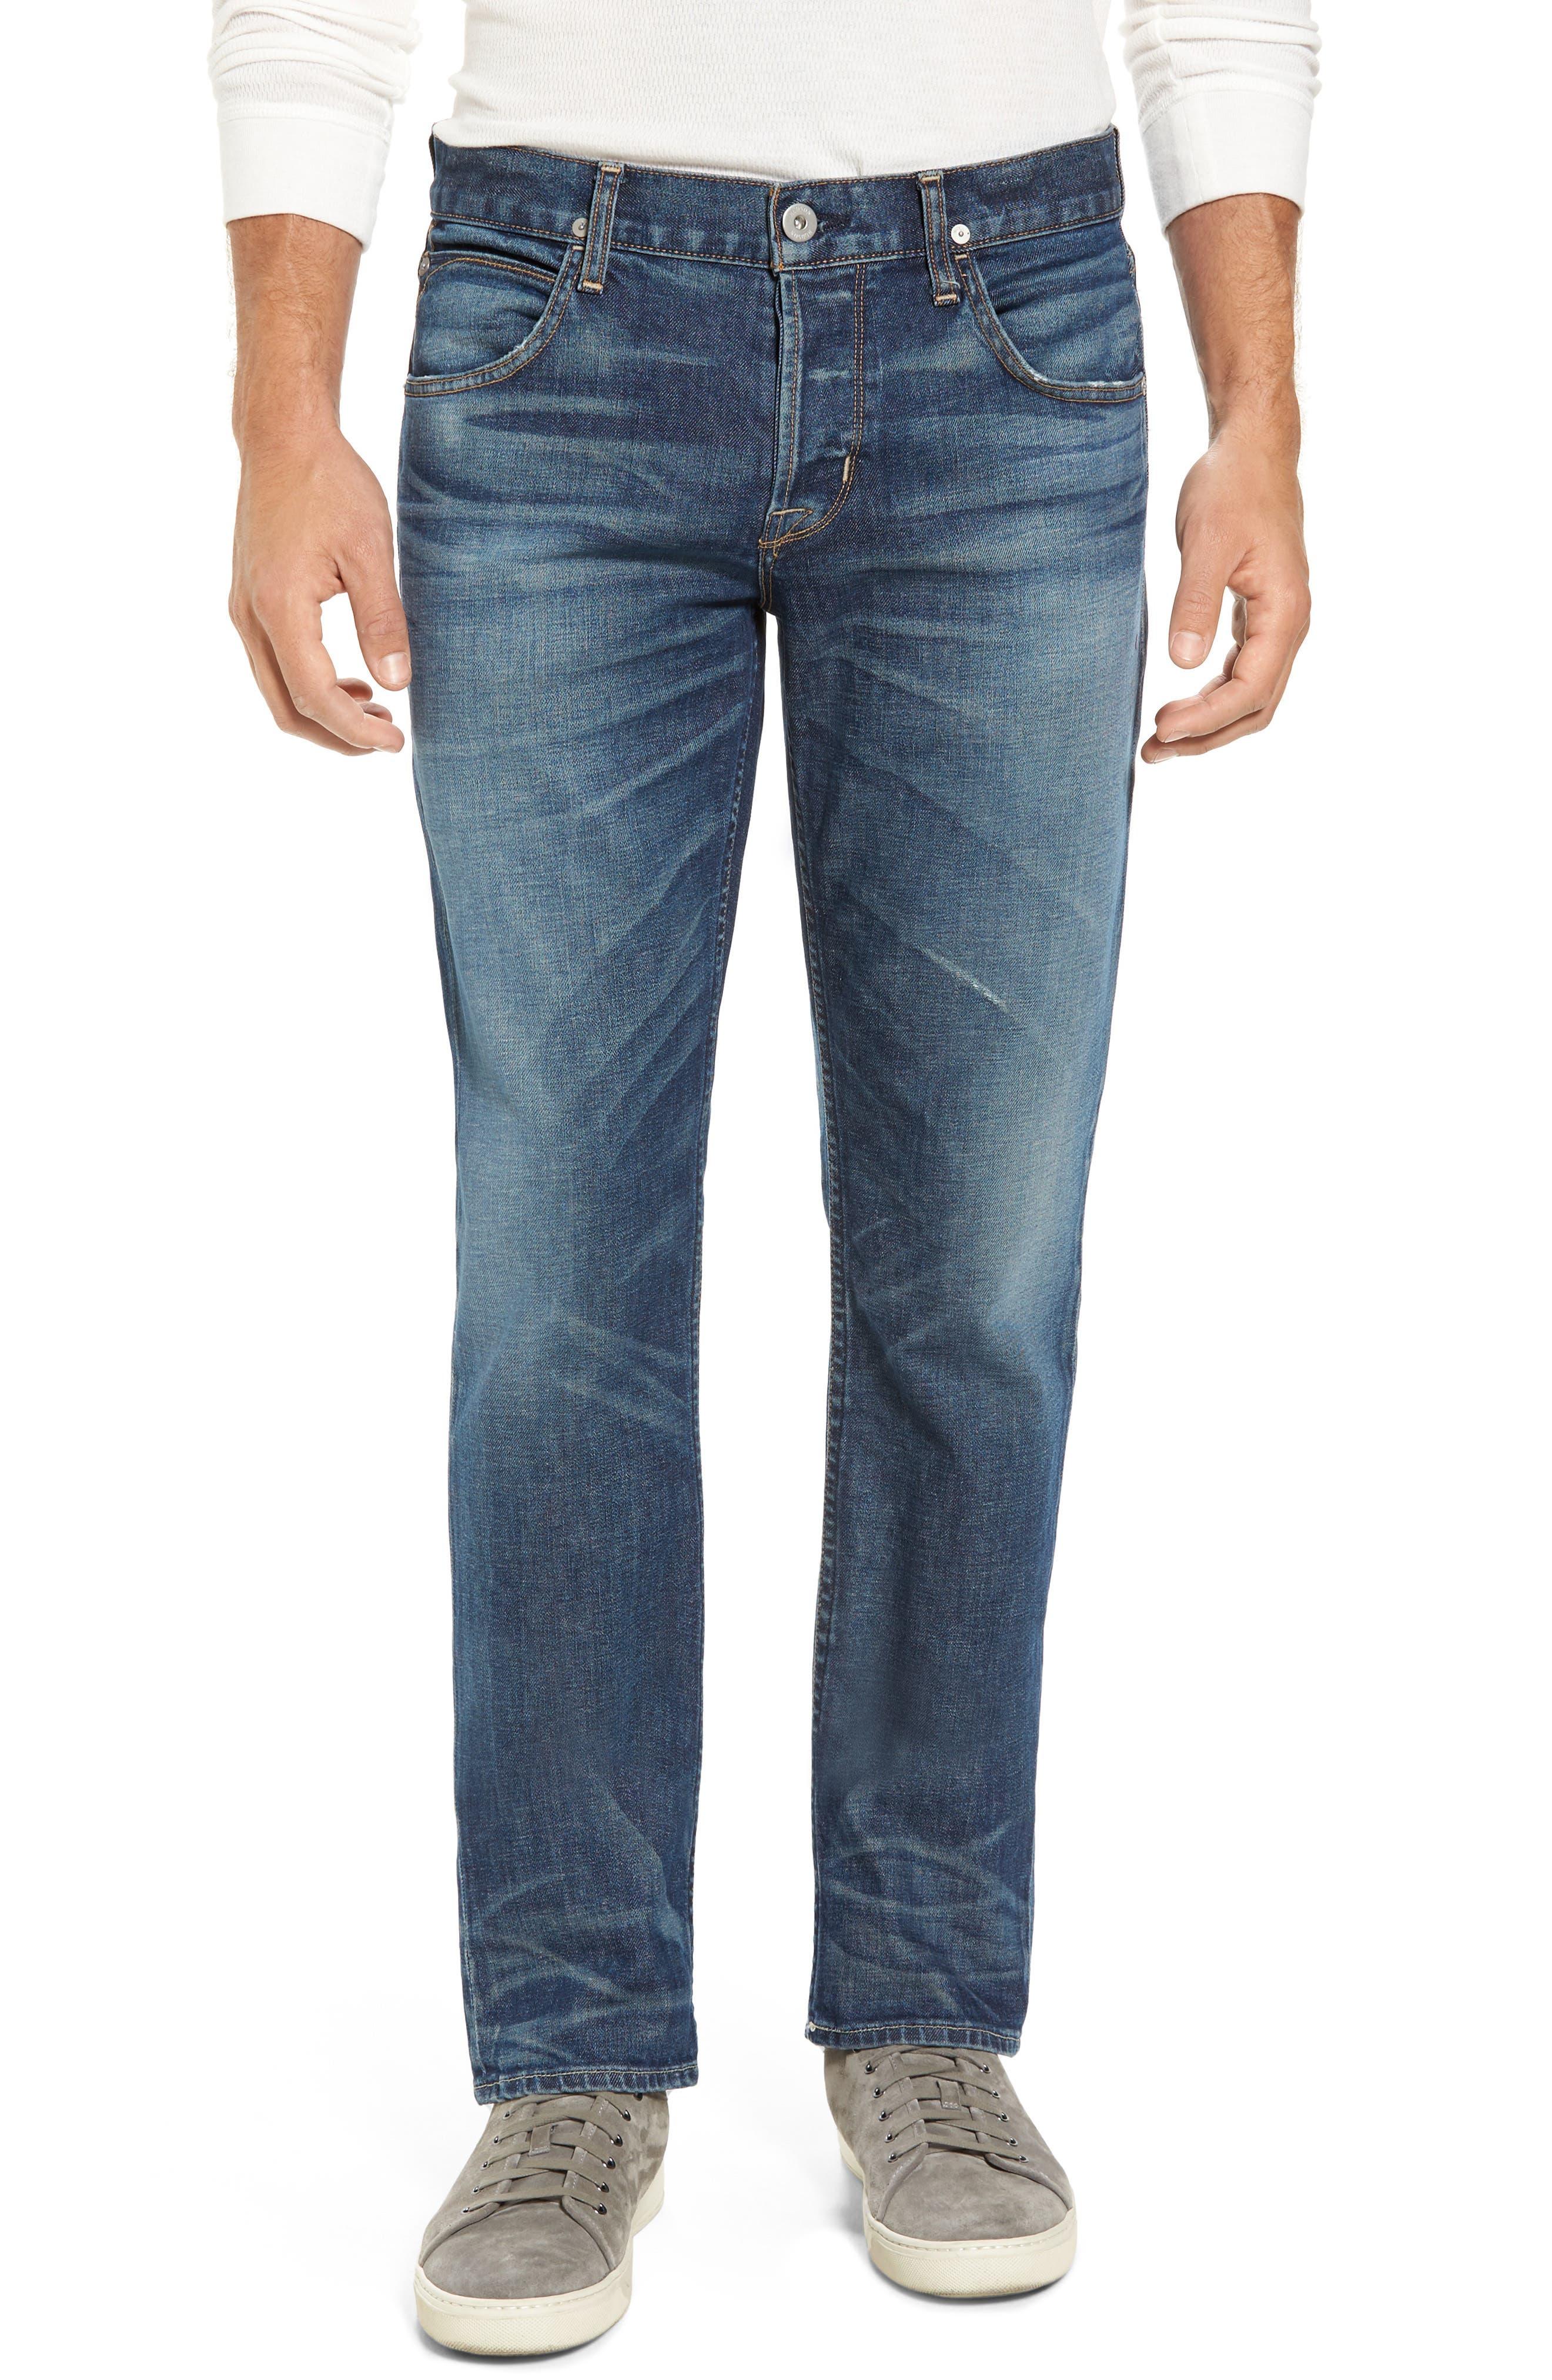 Main Image - Hudson Jeans Blake Slim Fit Jeans (Scribe)